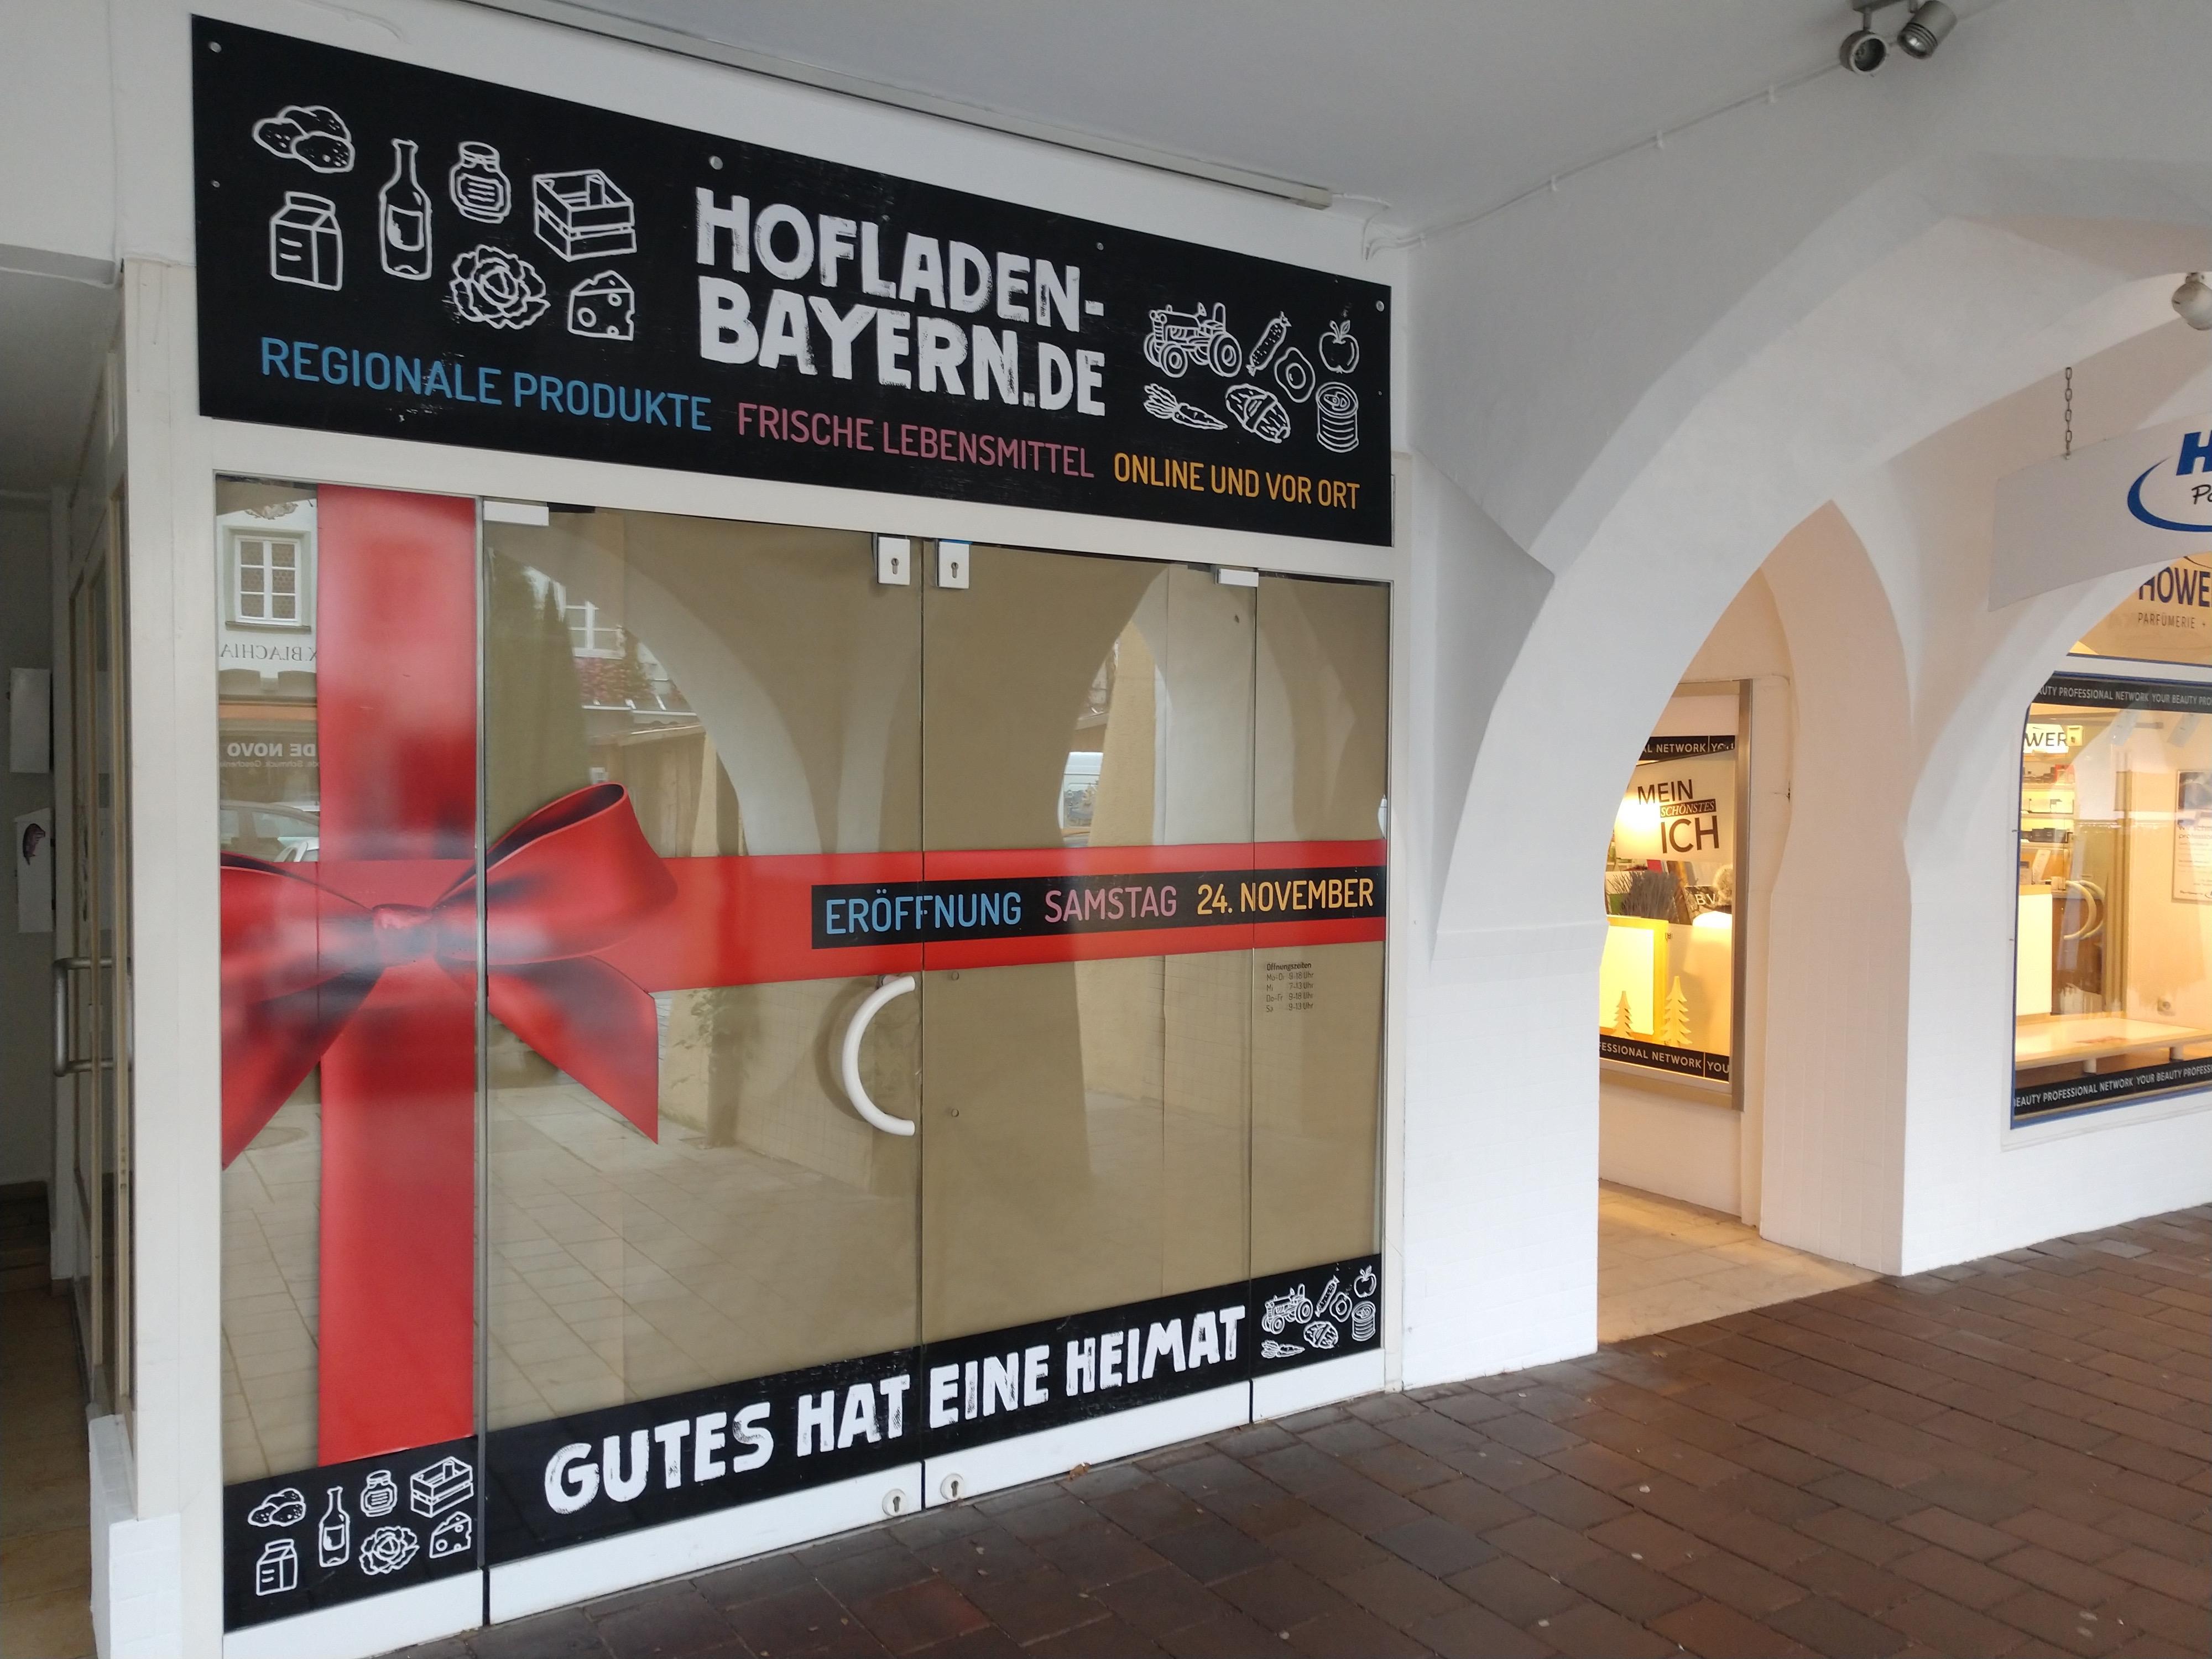 Filiale Neuötting - Ludwigstr. 44 - 84524 Neuötting - Hofladen-Bayern.de